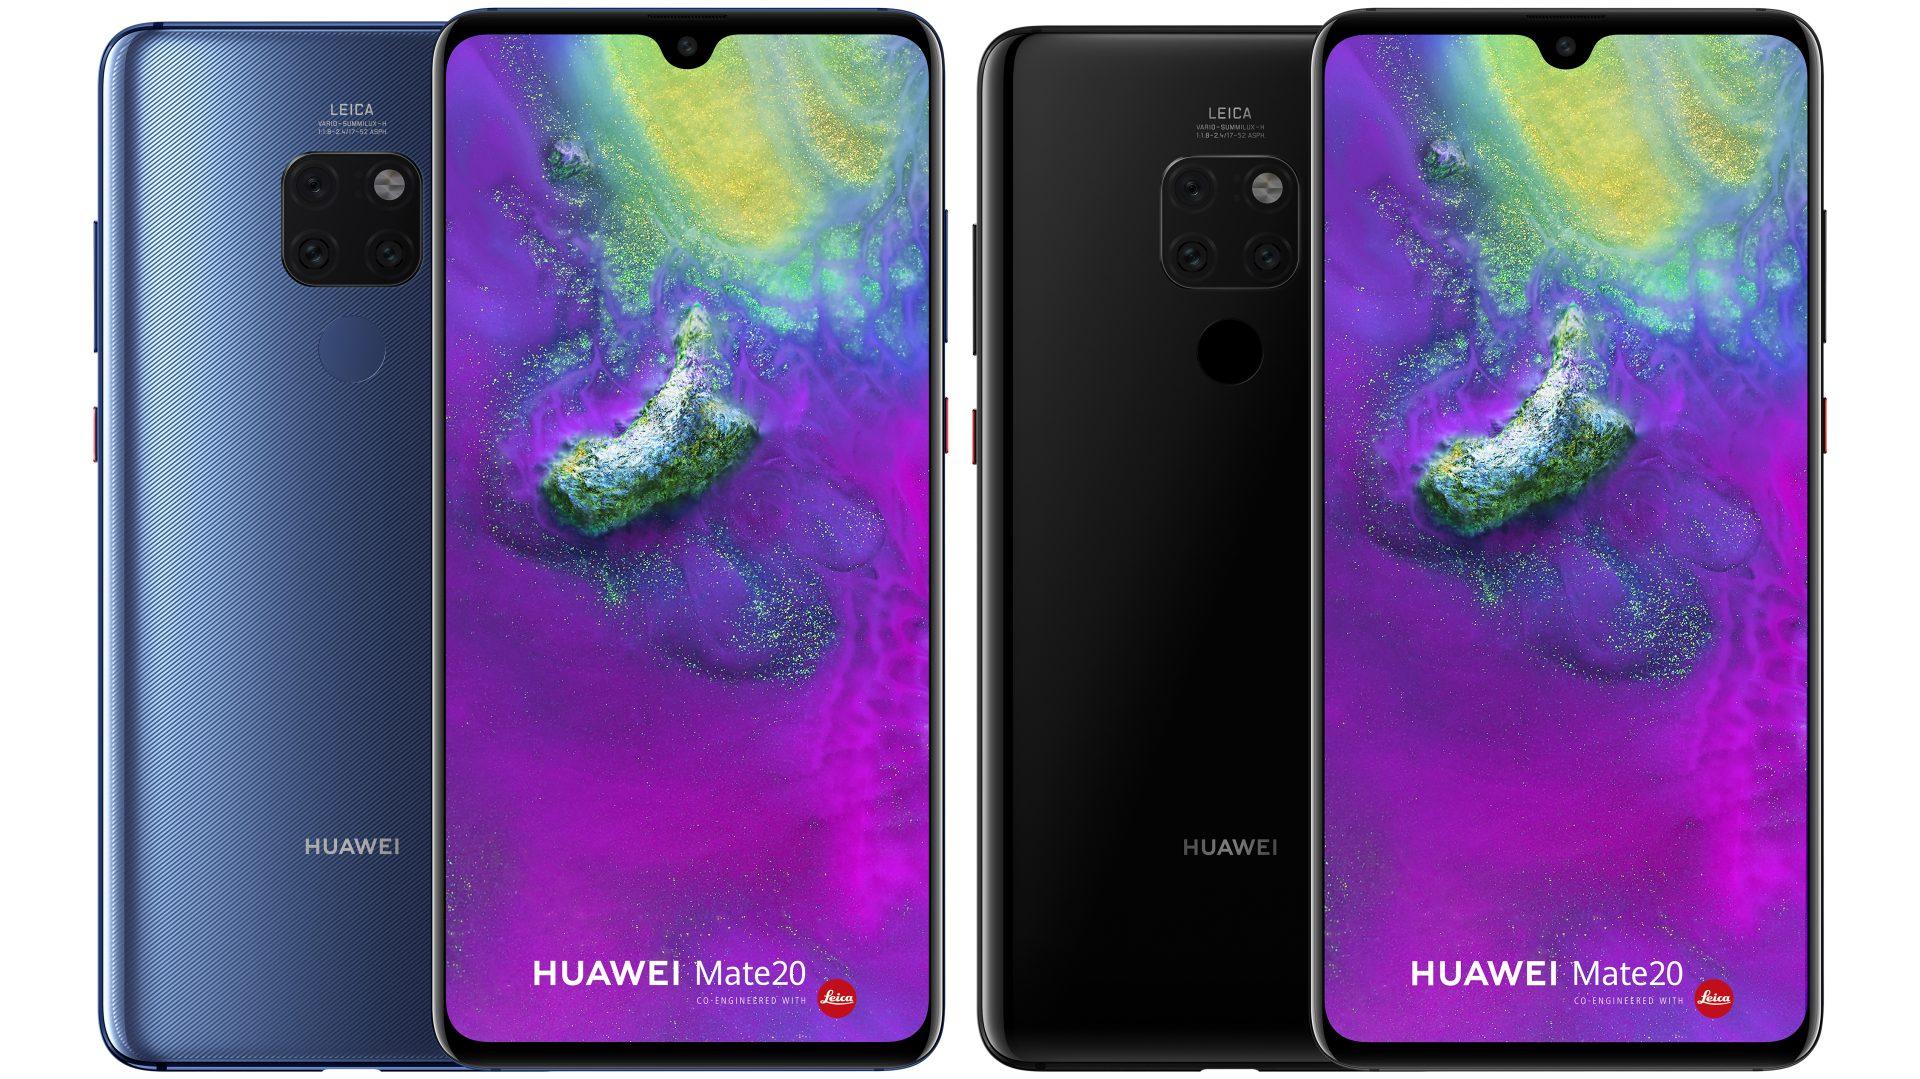 Huawei Mate 20 Özellikleri